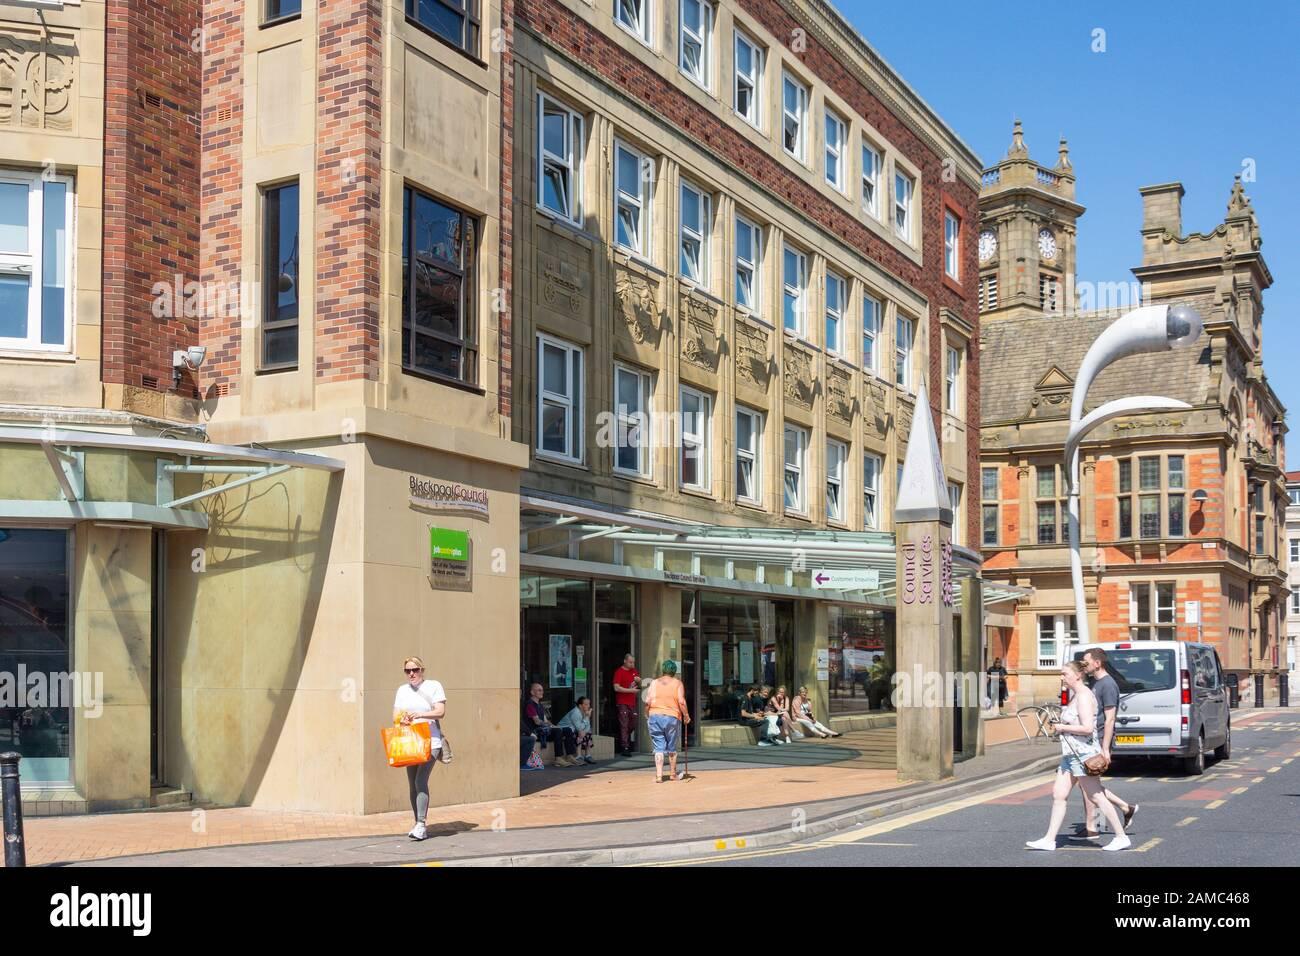 Blackpool Jobcentre, Blackpool Council Services, Municipal Buildings, Corporation Street, Blackpool, Lancashire, England, United Kingdom Stock Photo